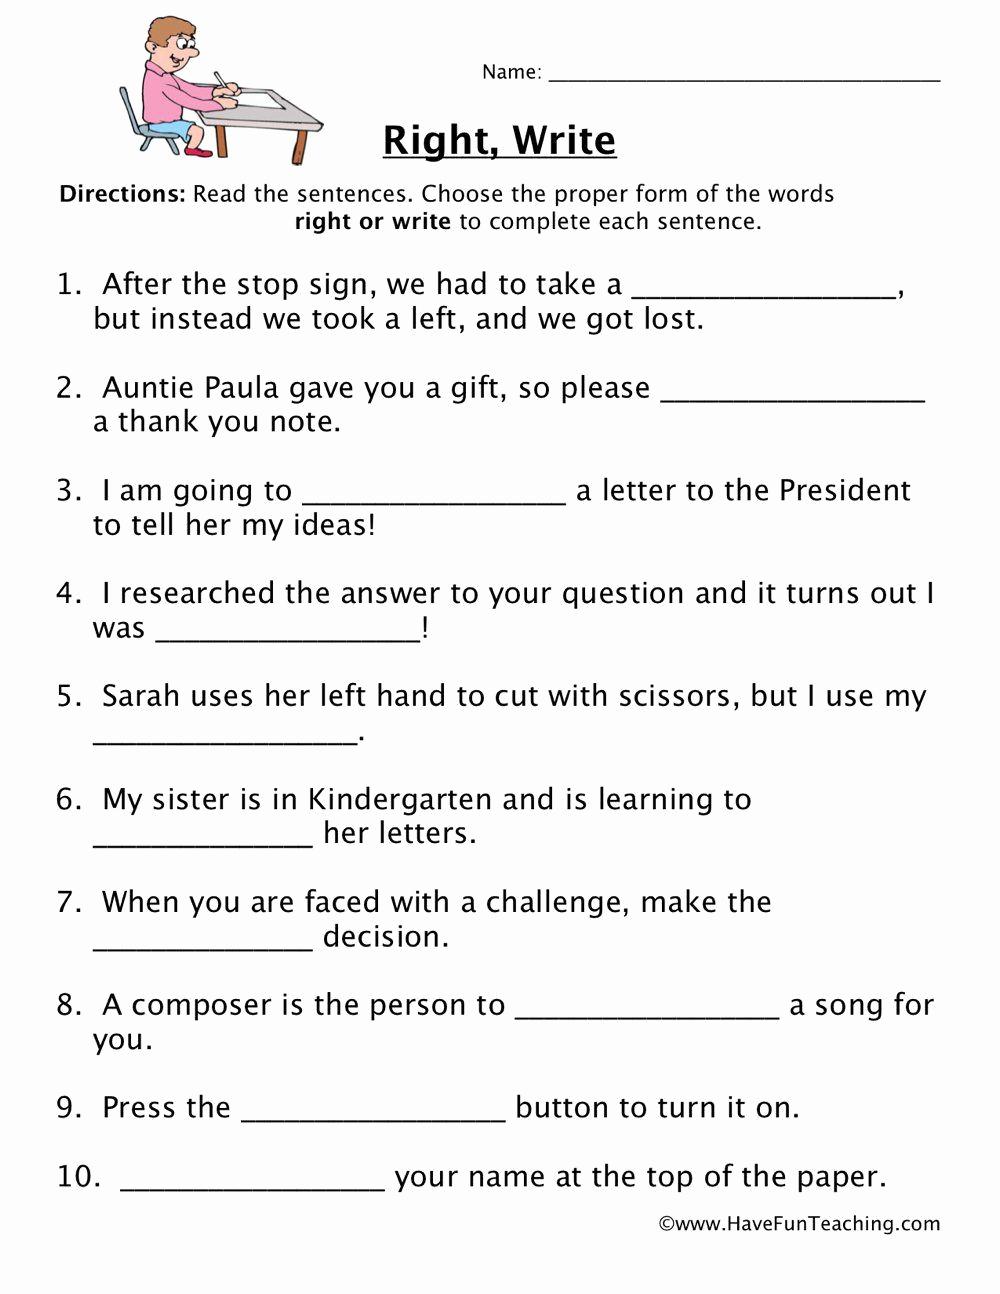 Homonym Worksheets High School Best Of Homonym Worksheets High School – Worksheet From Home